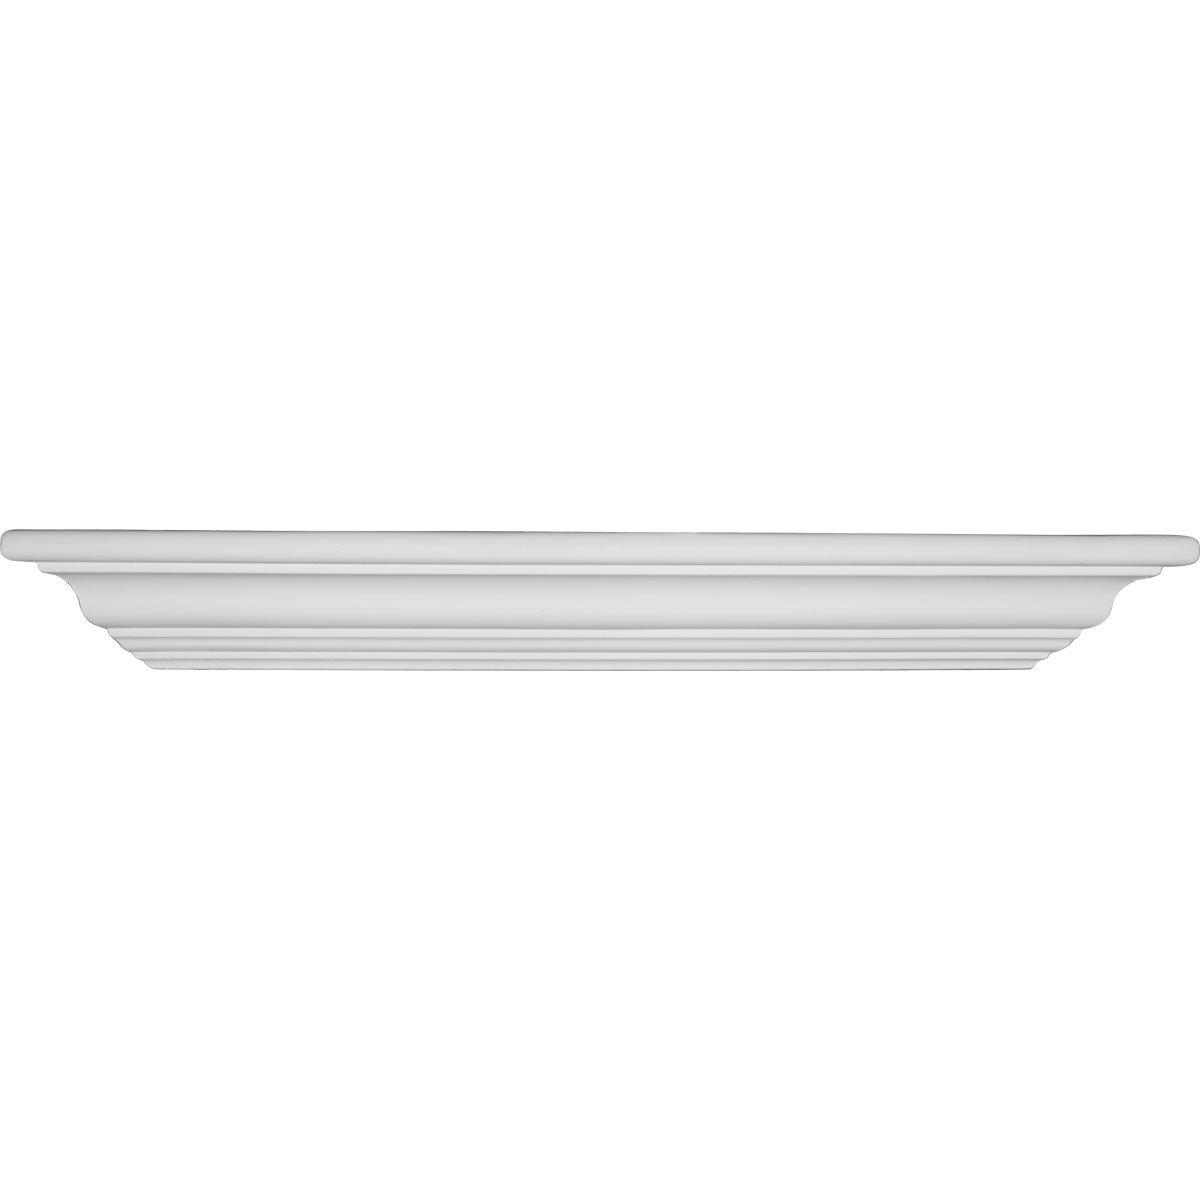 Ekena Millwork SH23X16X03 Shelf, Corner 22 7 8 W x 16 1 4, Factory Primed White